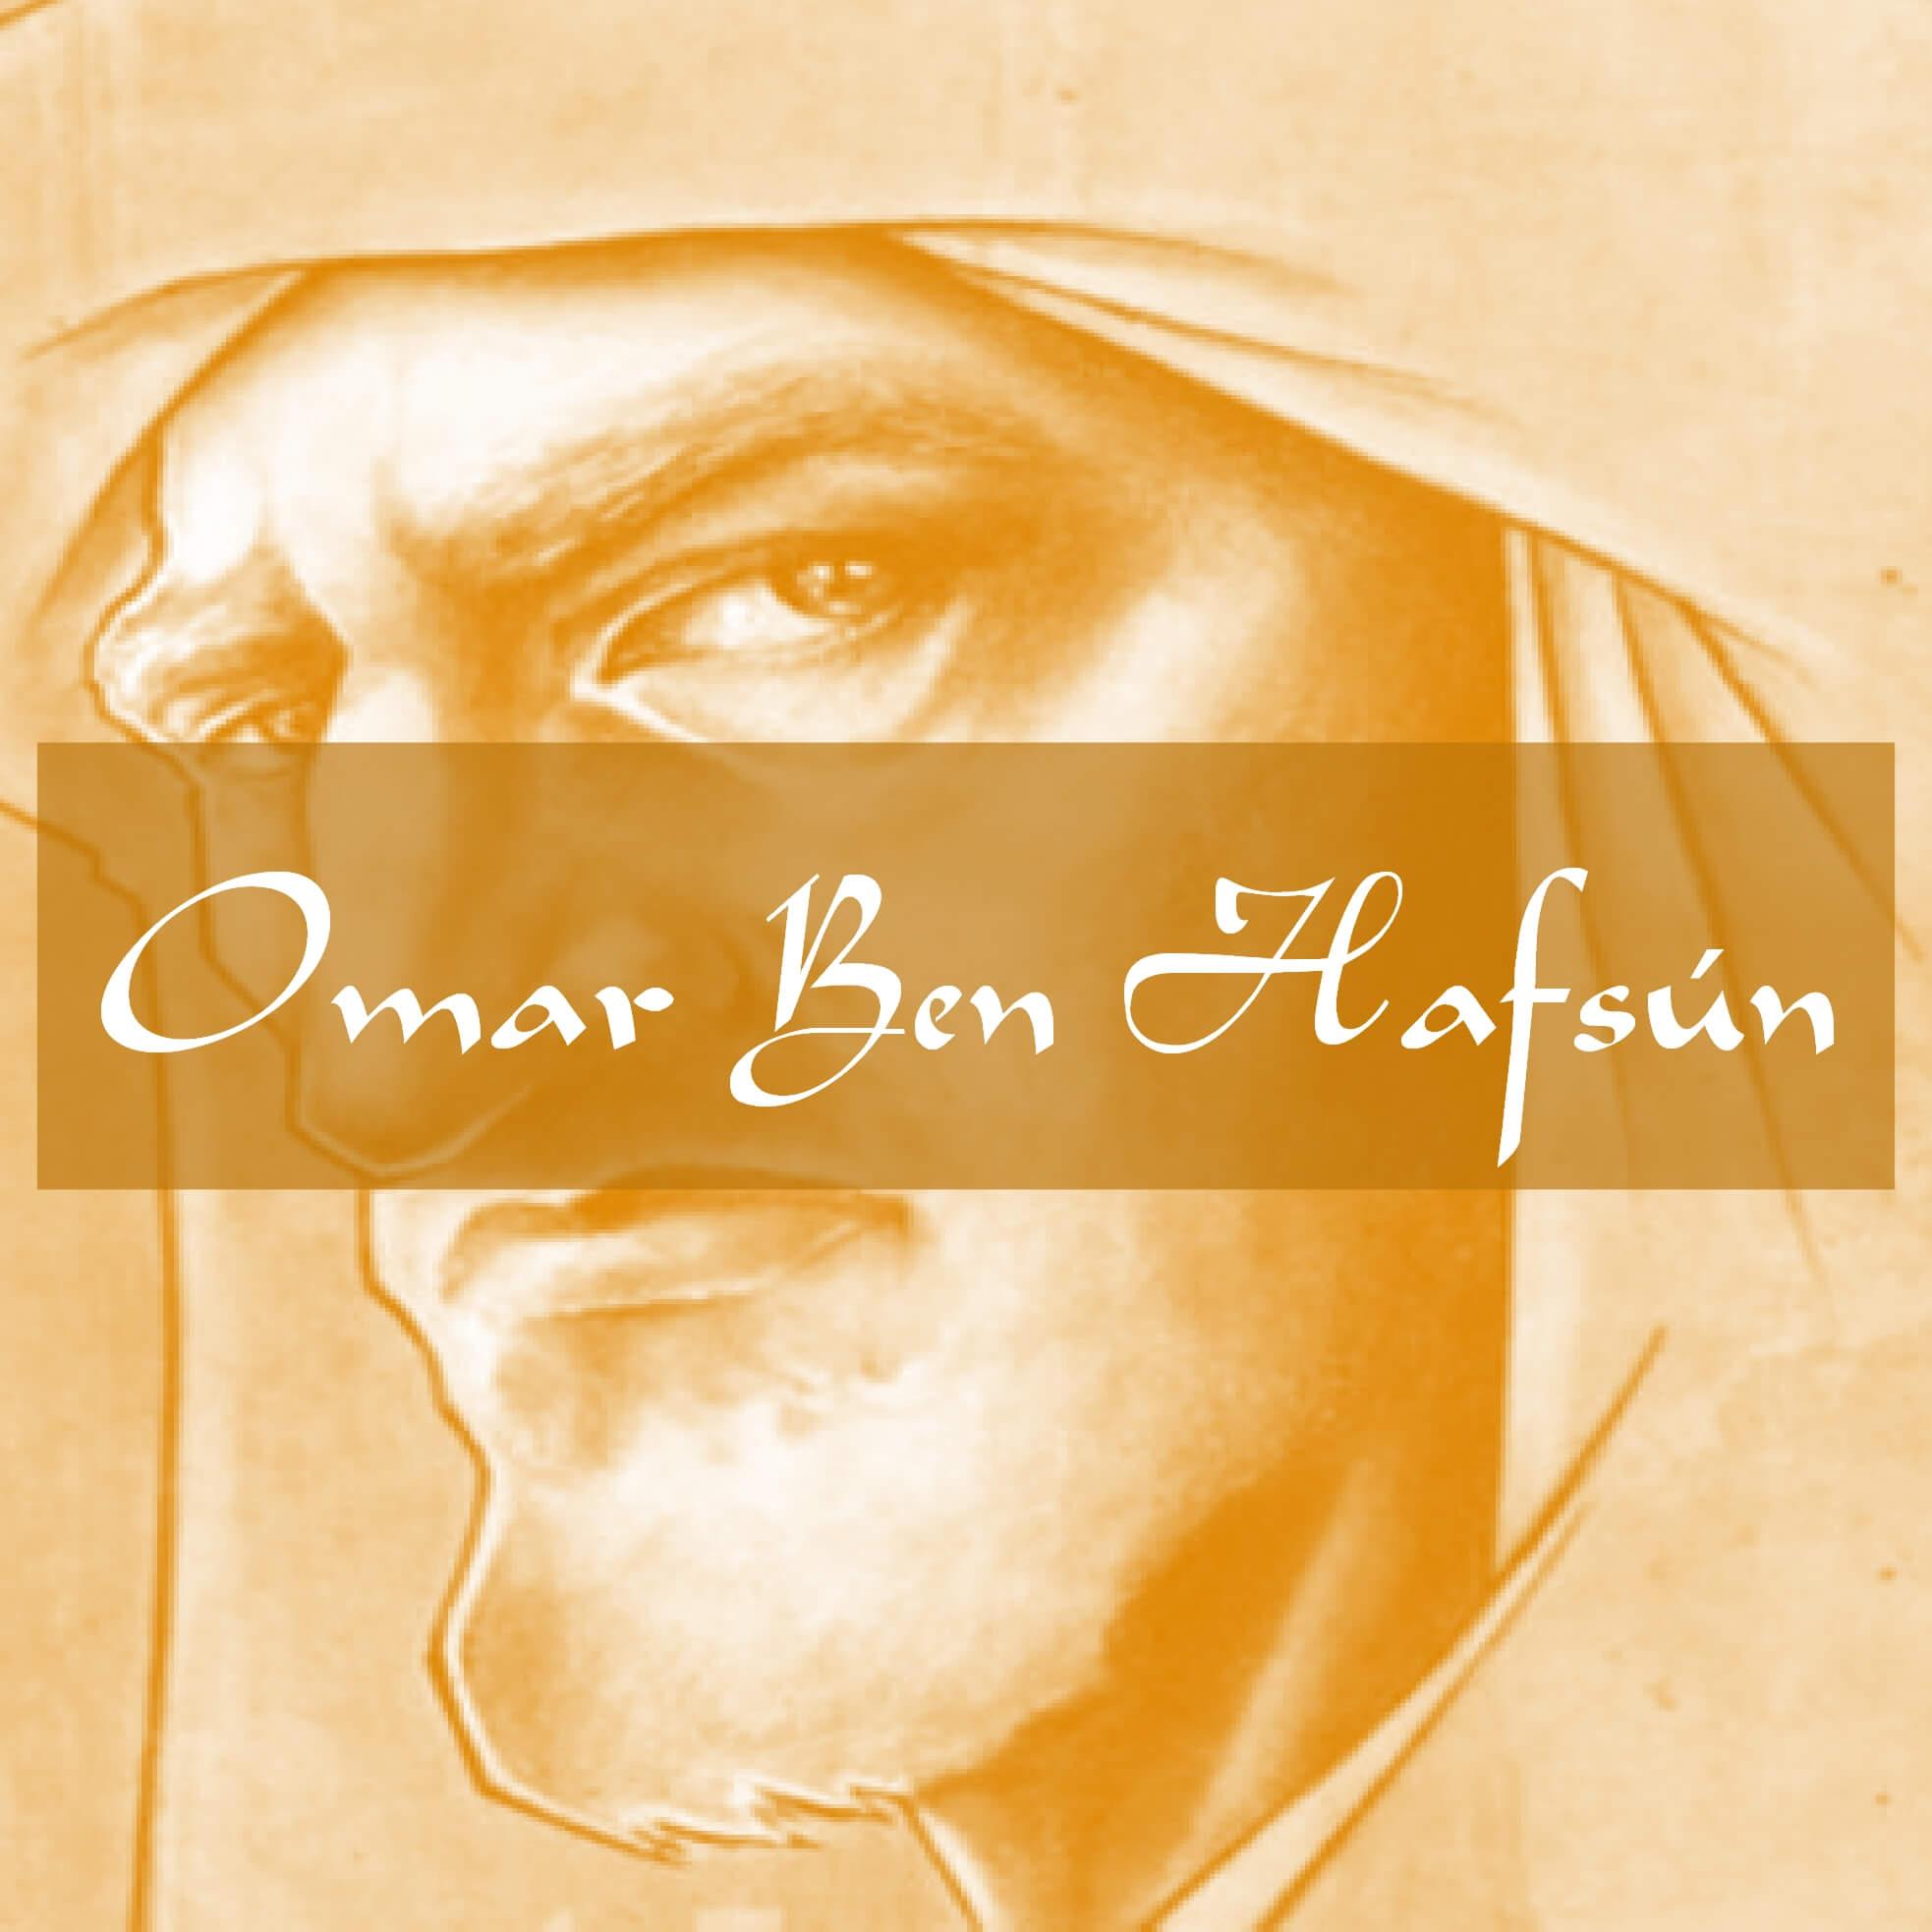 Omar Ben Hafsun Parauta Histori Malaga